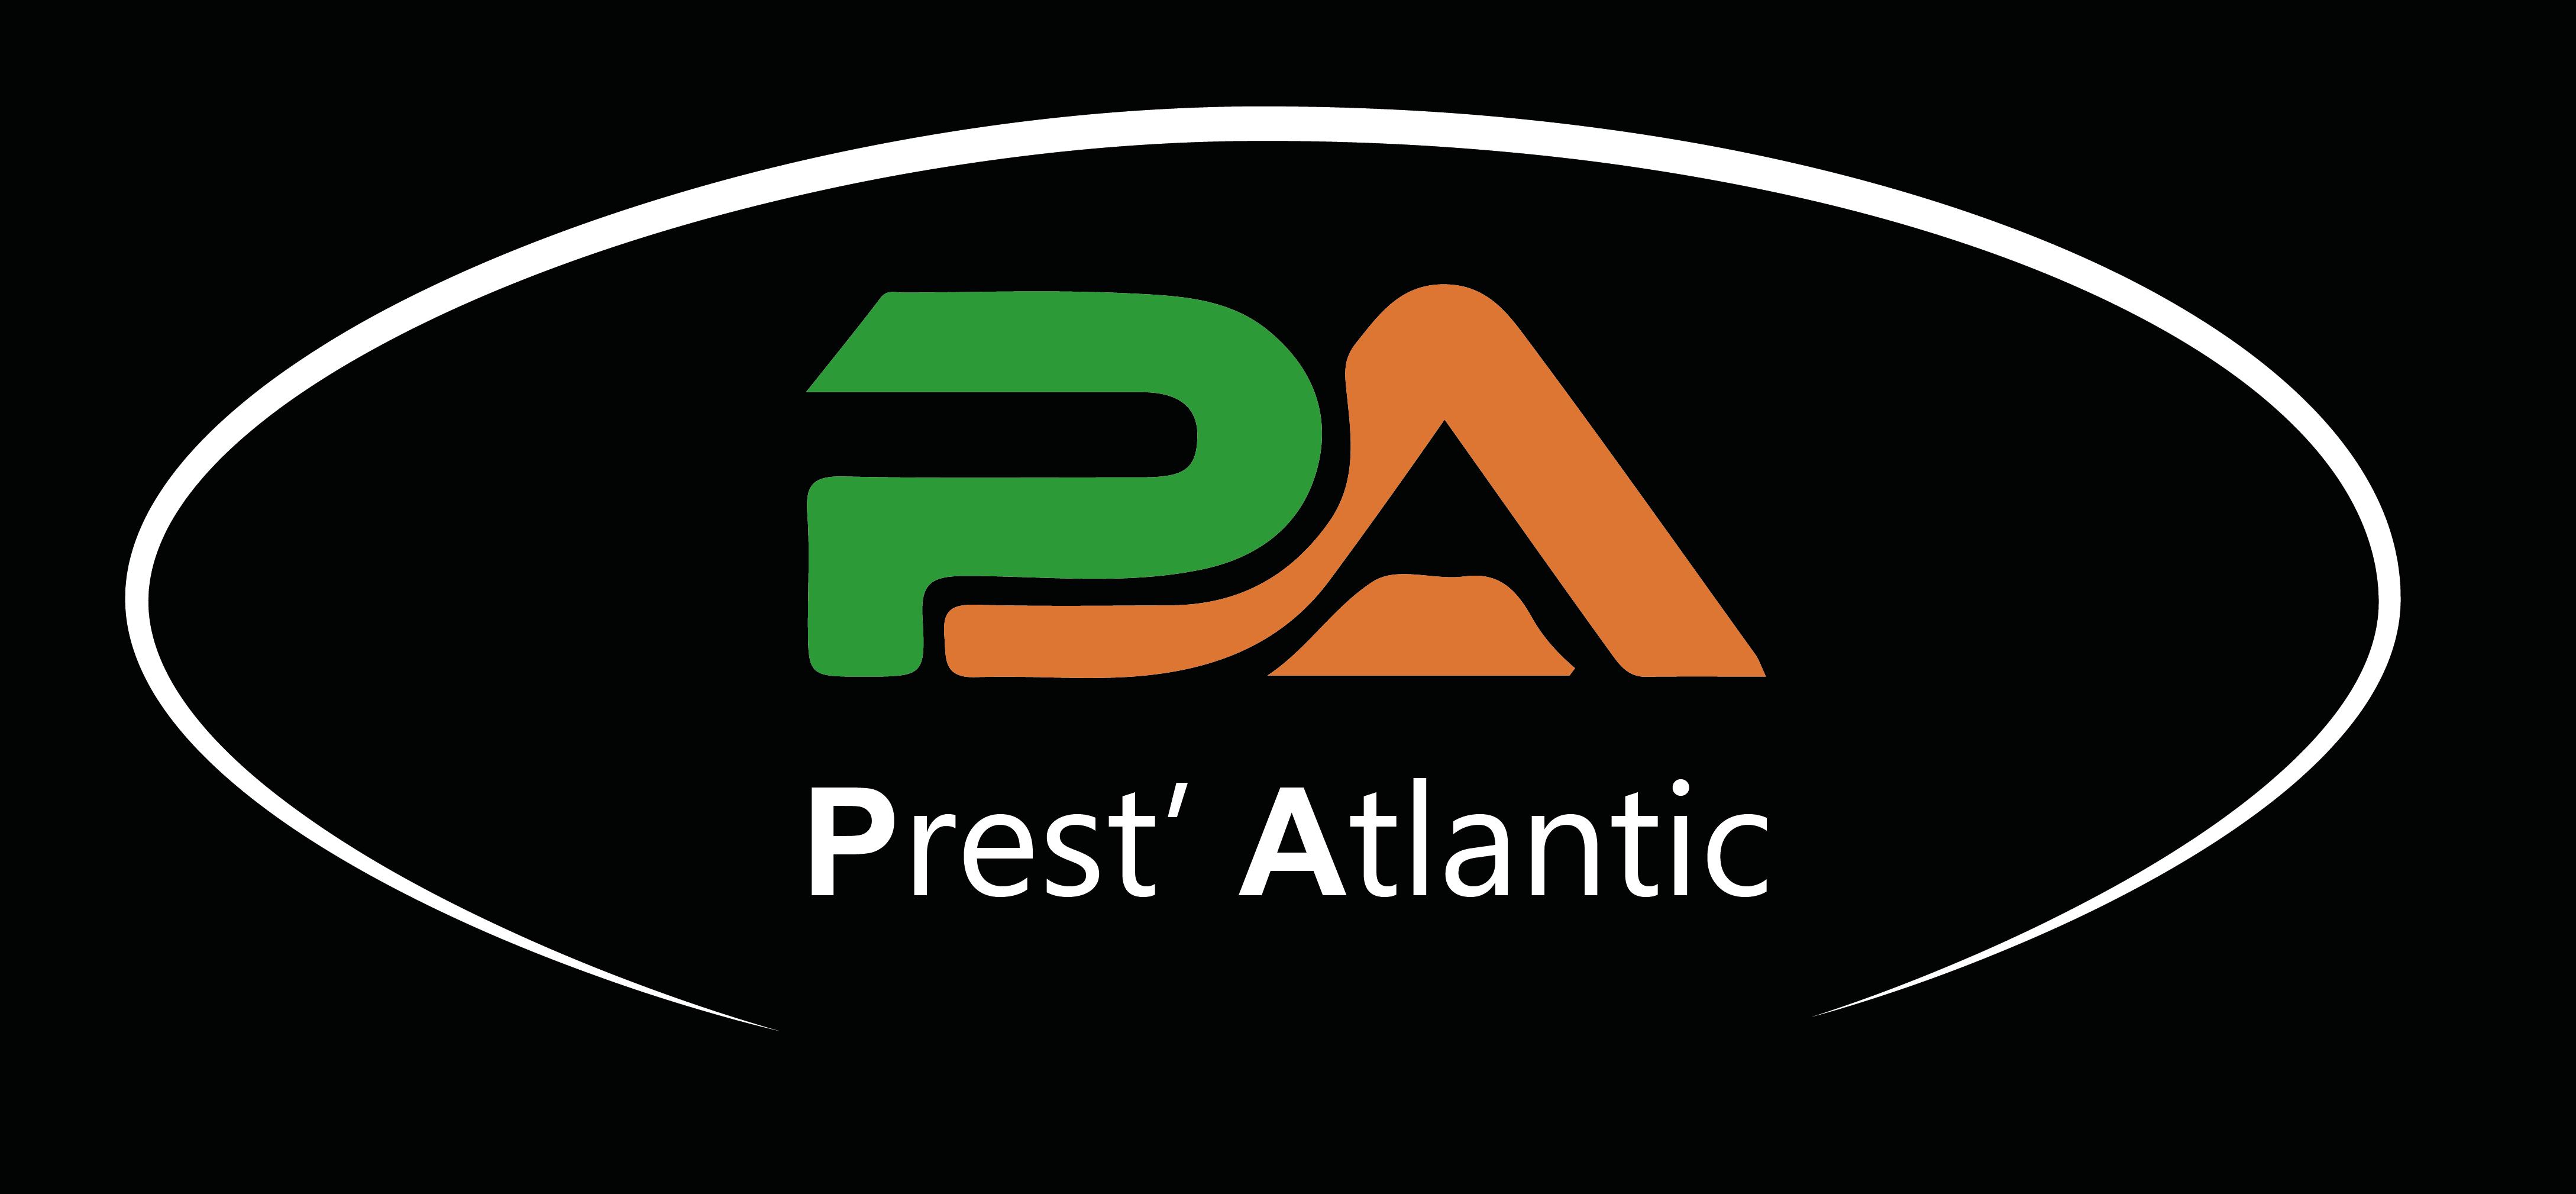 Prest Atlantic